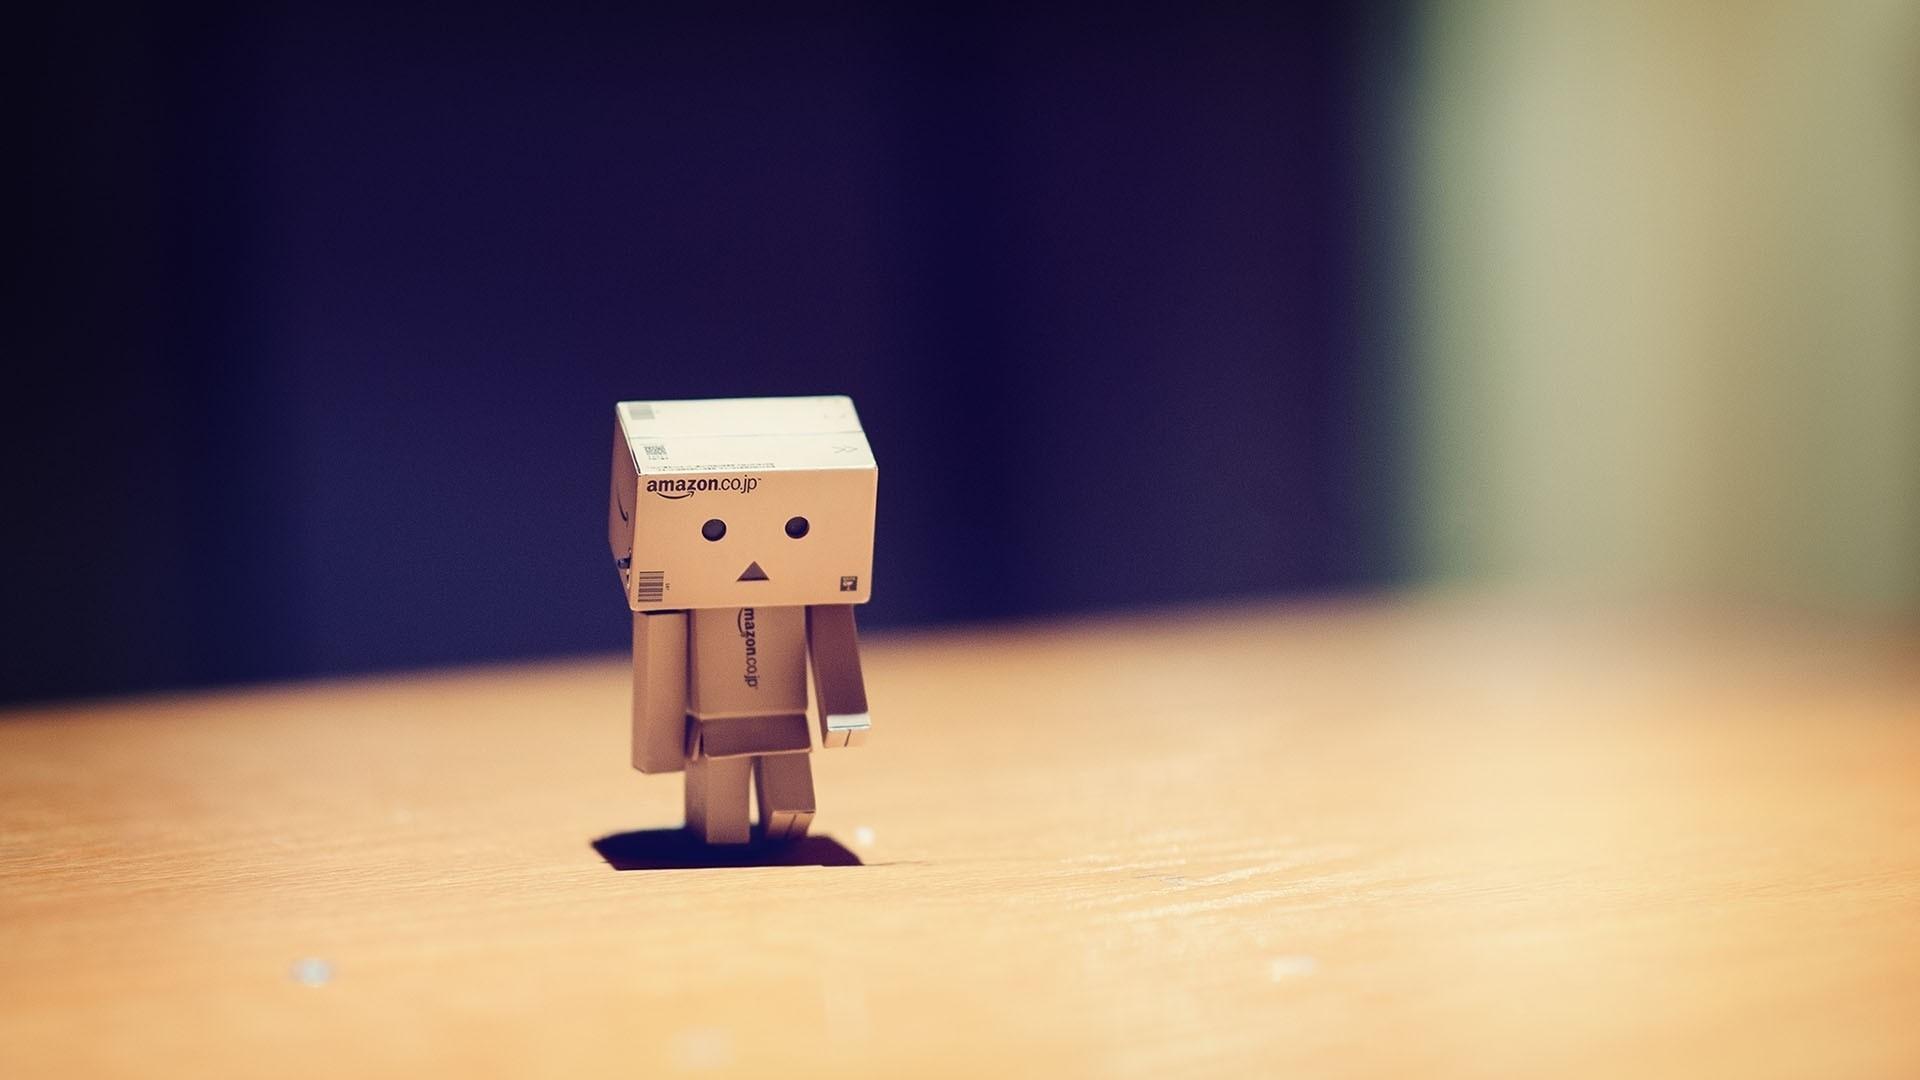 Hd Wallpaper Sad Boy And Girl Sad Wallpapers Hd Pixelstalk Net